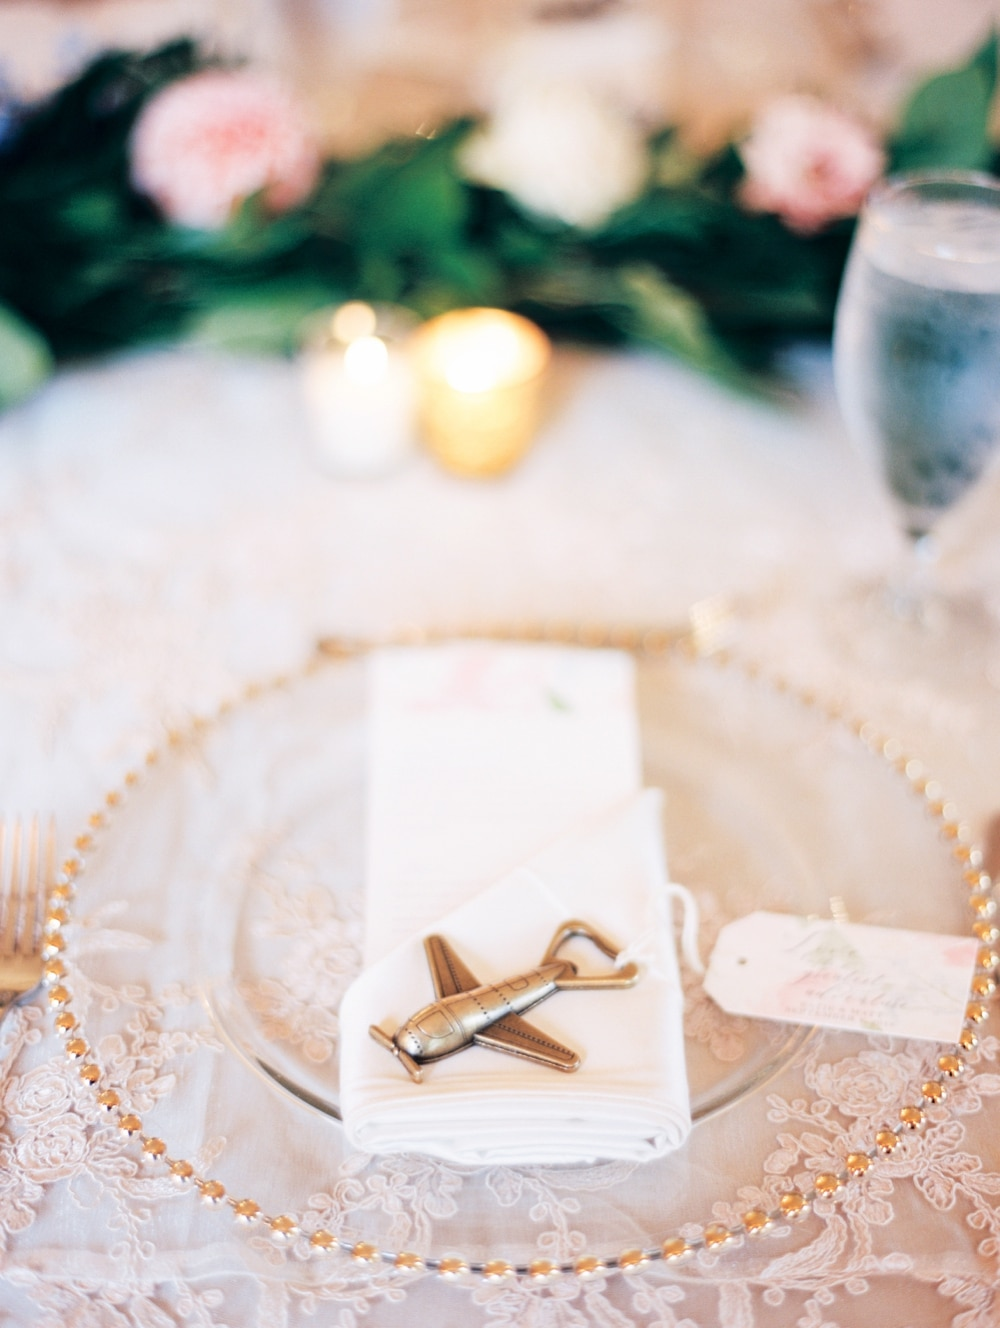 kristin-la-voie-photography-henry-ford-museum-detroit-wedding-photographer-165